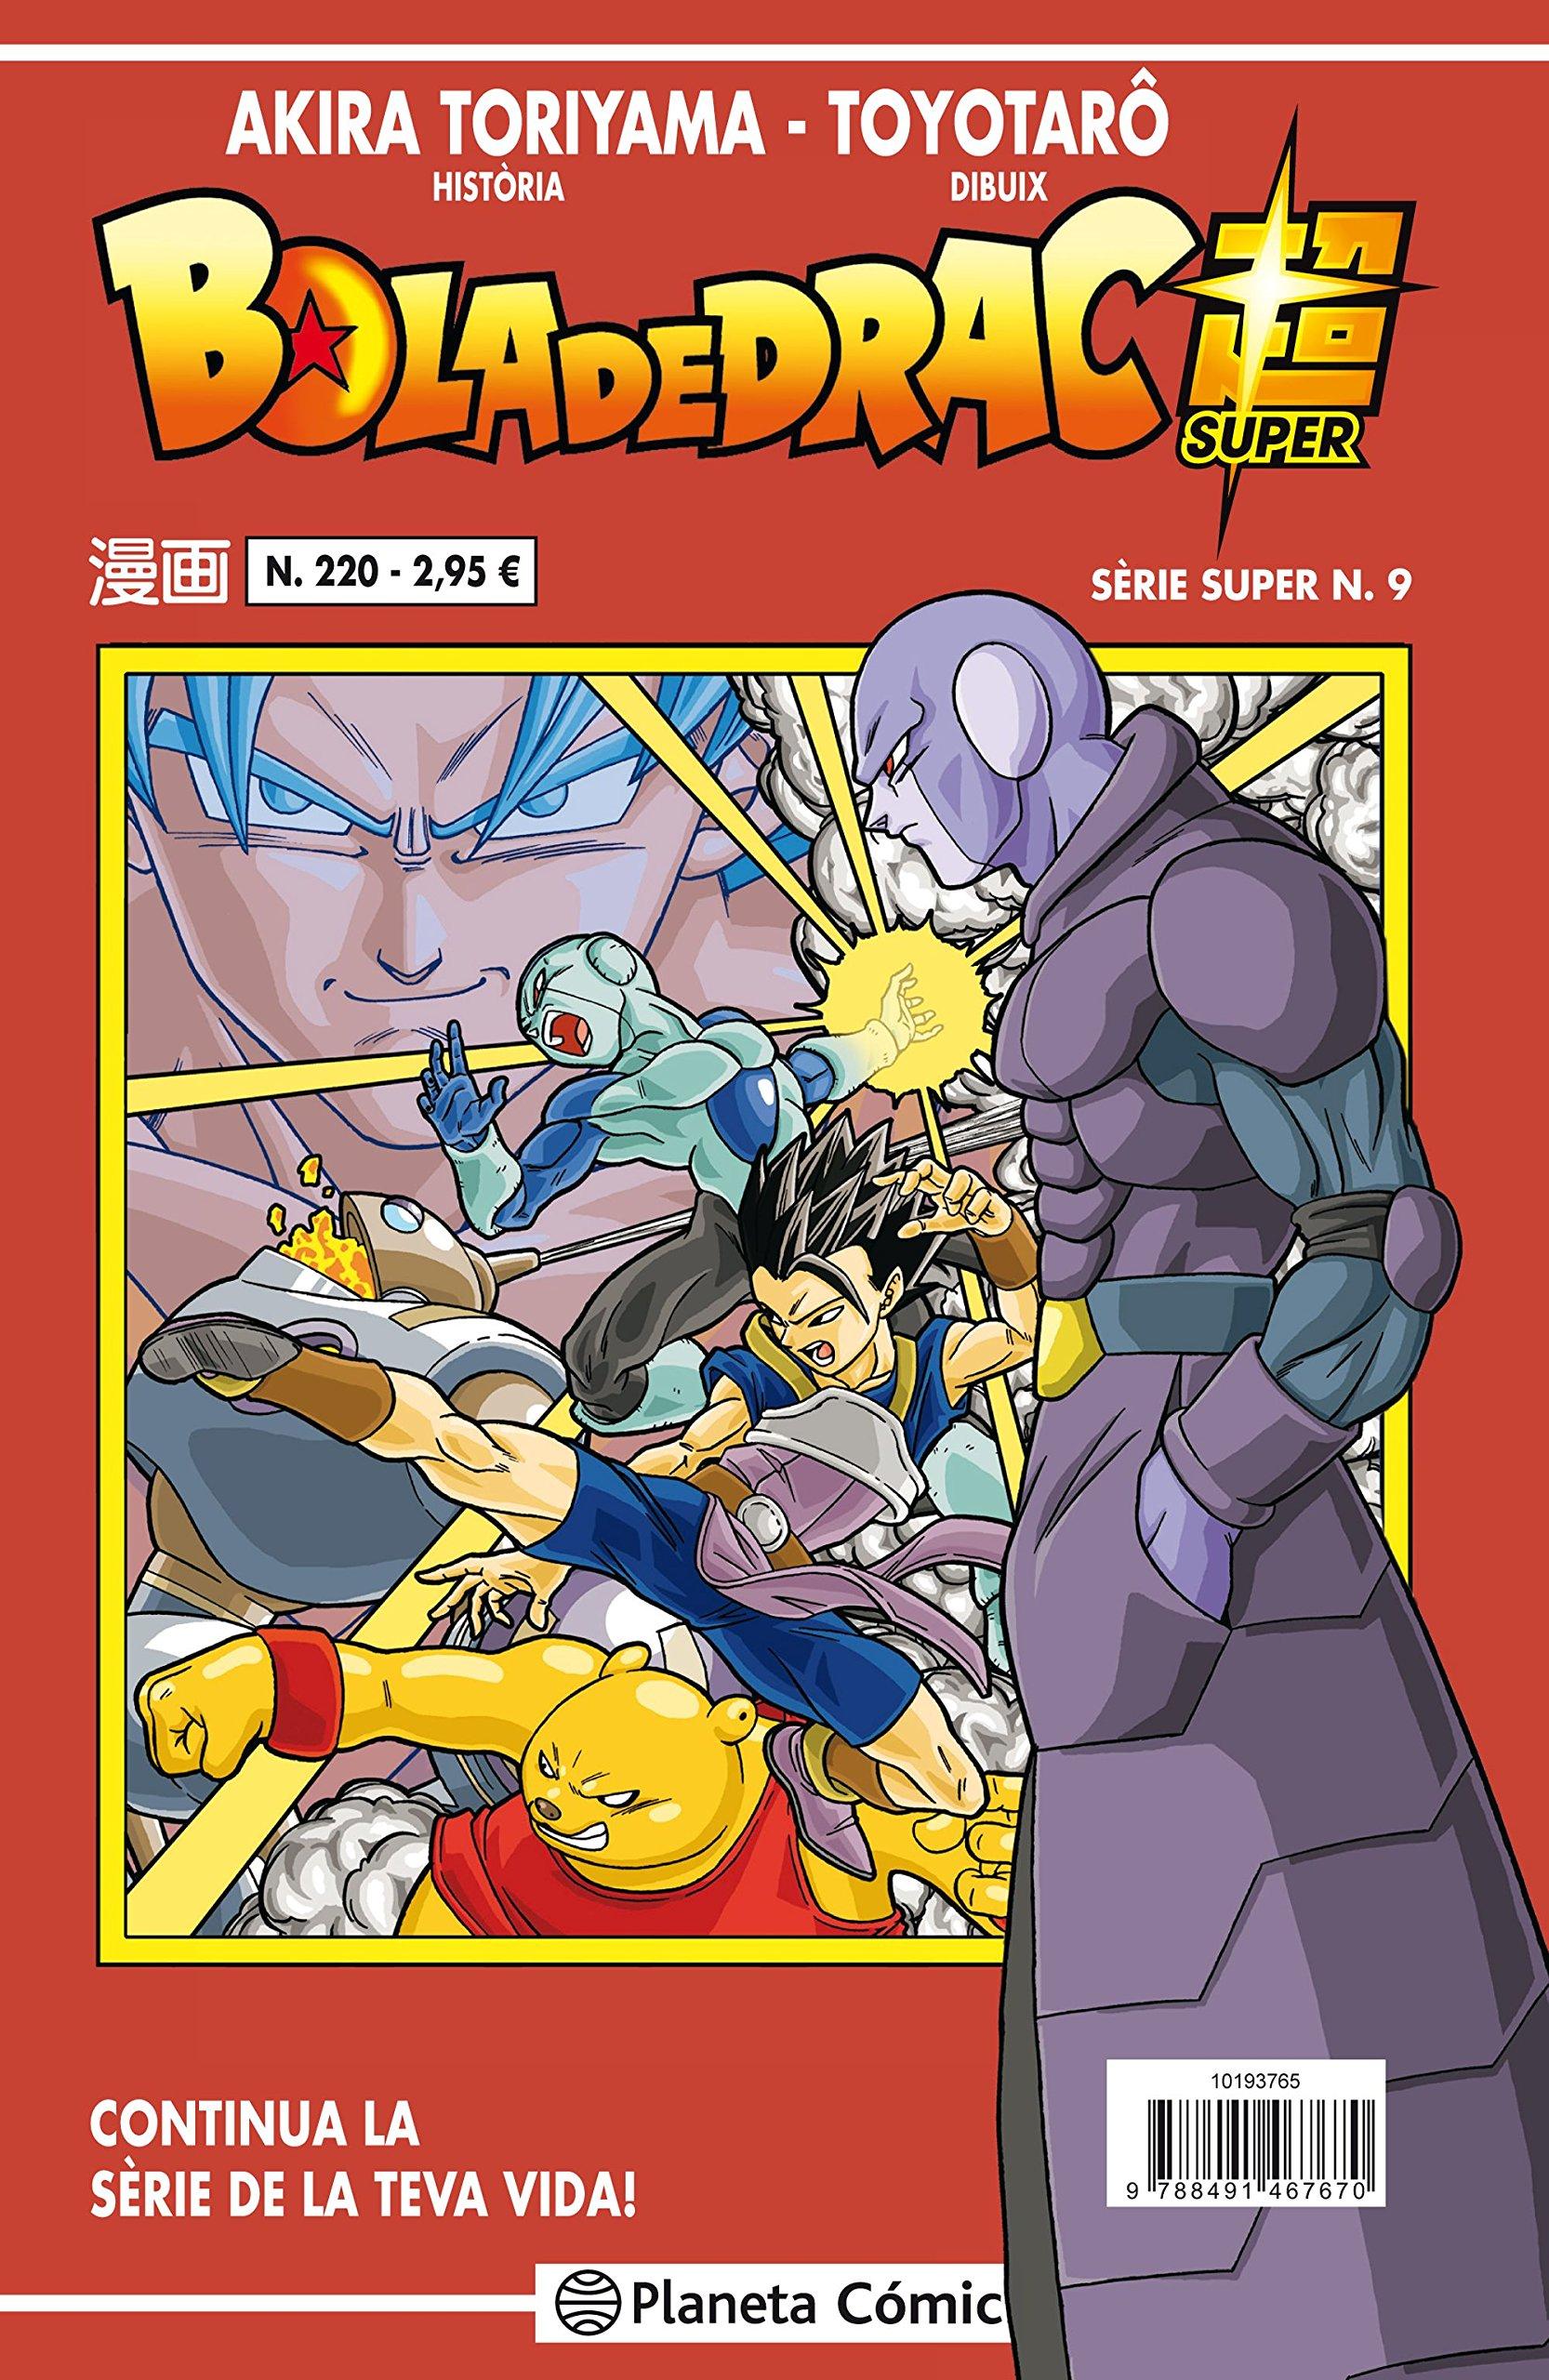 Bola de Drac Sèrie vermella nº 220 (Manga Shonen) (Catalán) Tapa blanda – 3 jul 2018 Akira Toriyama Daruma Planeta DeAgostini Cómics 849146767X